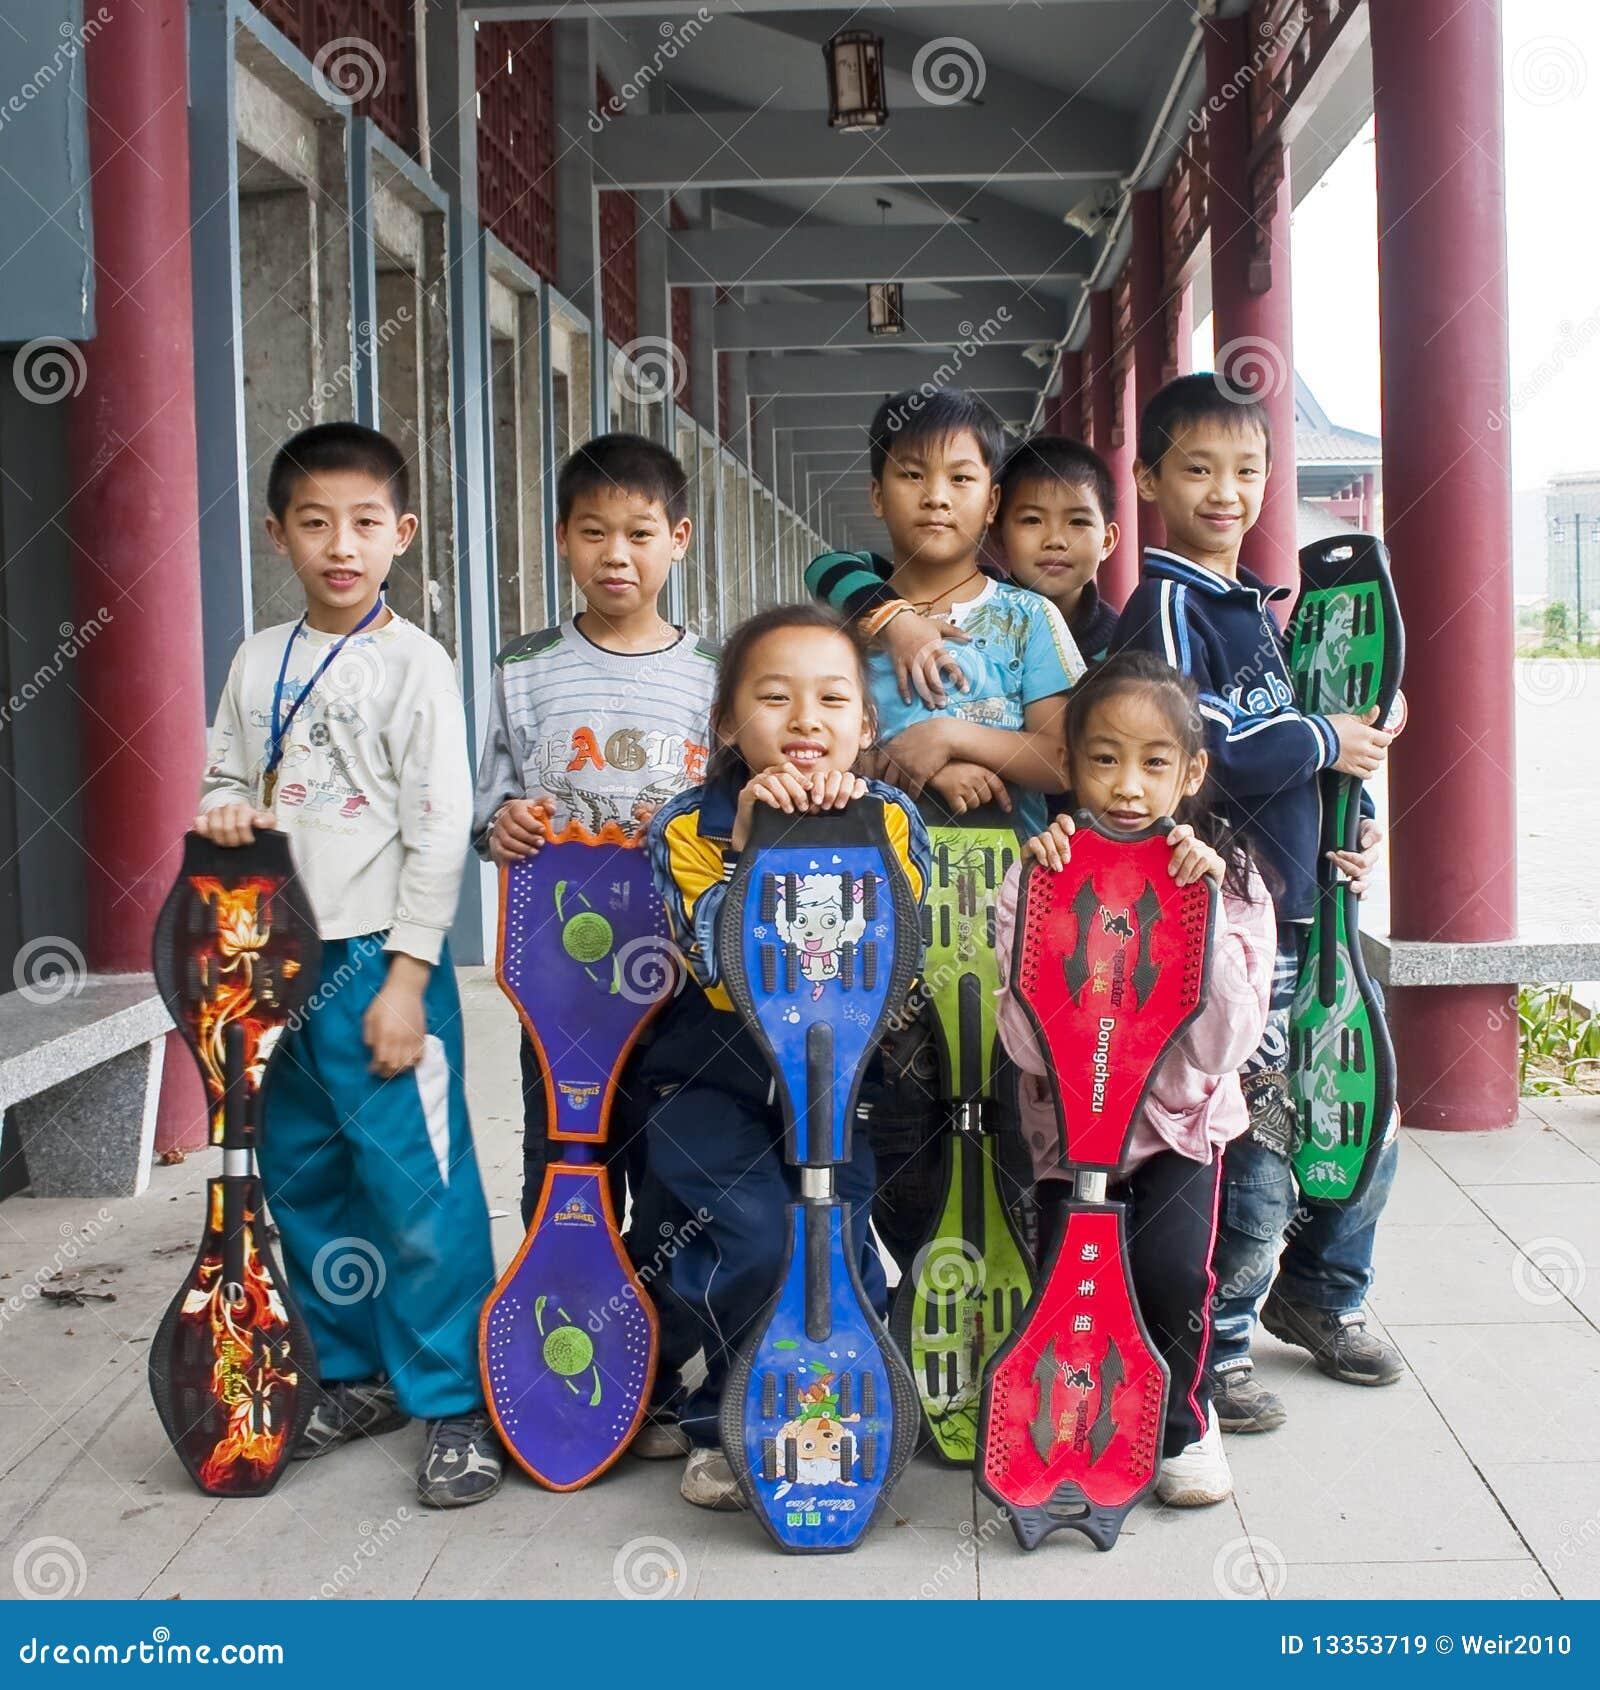 Playing skateboard children